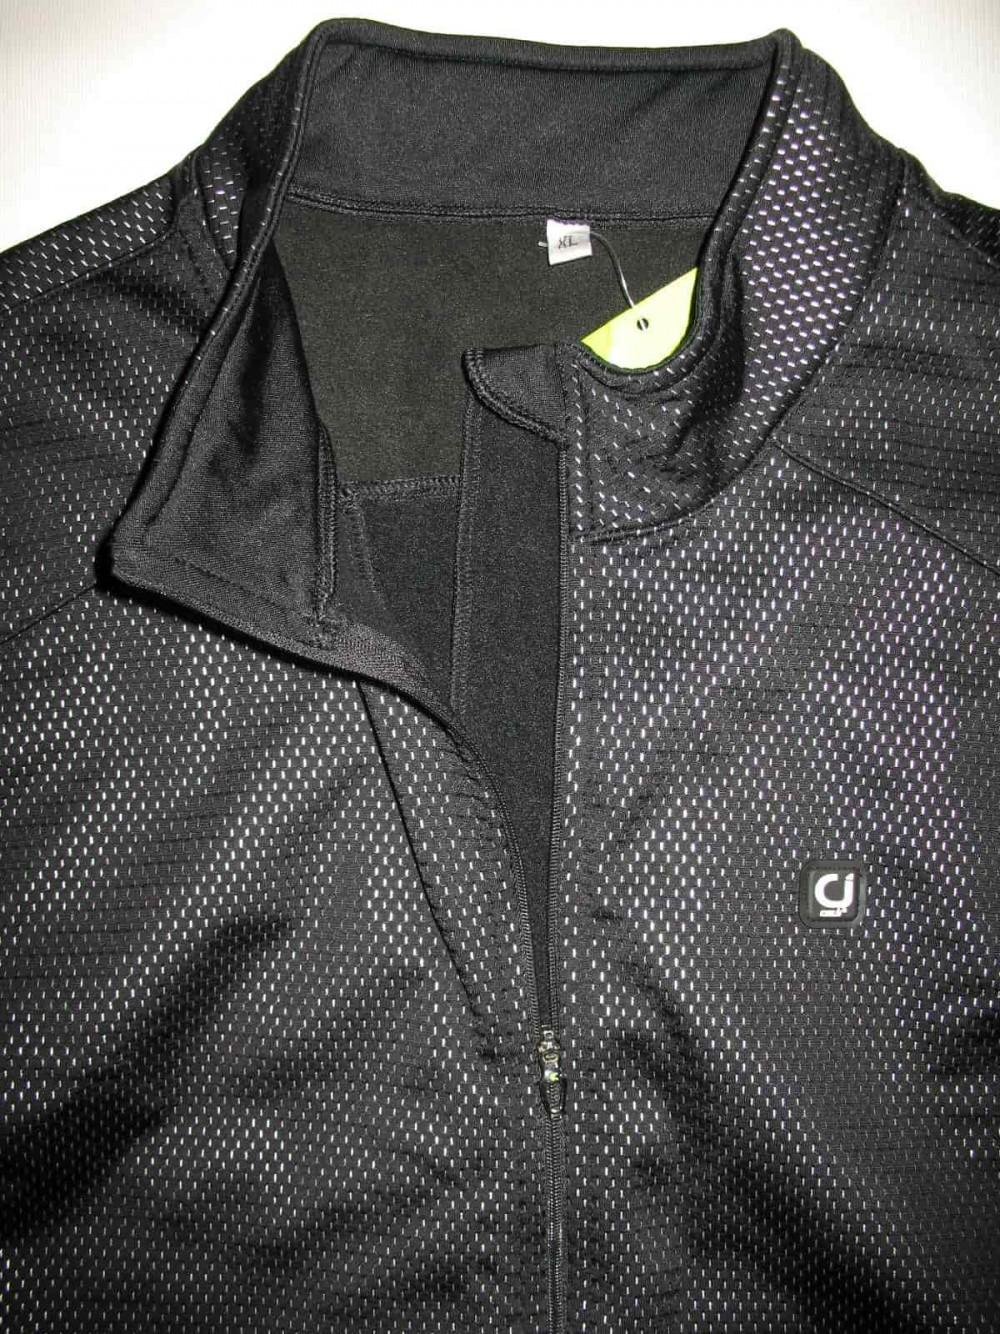 CHEJI cycling windstopper jacket (размер XL/L) - 3